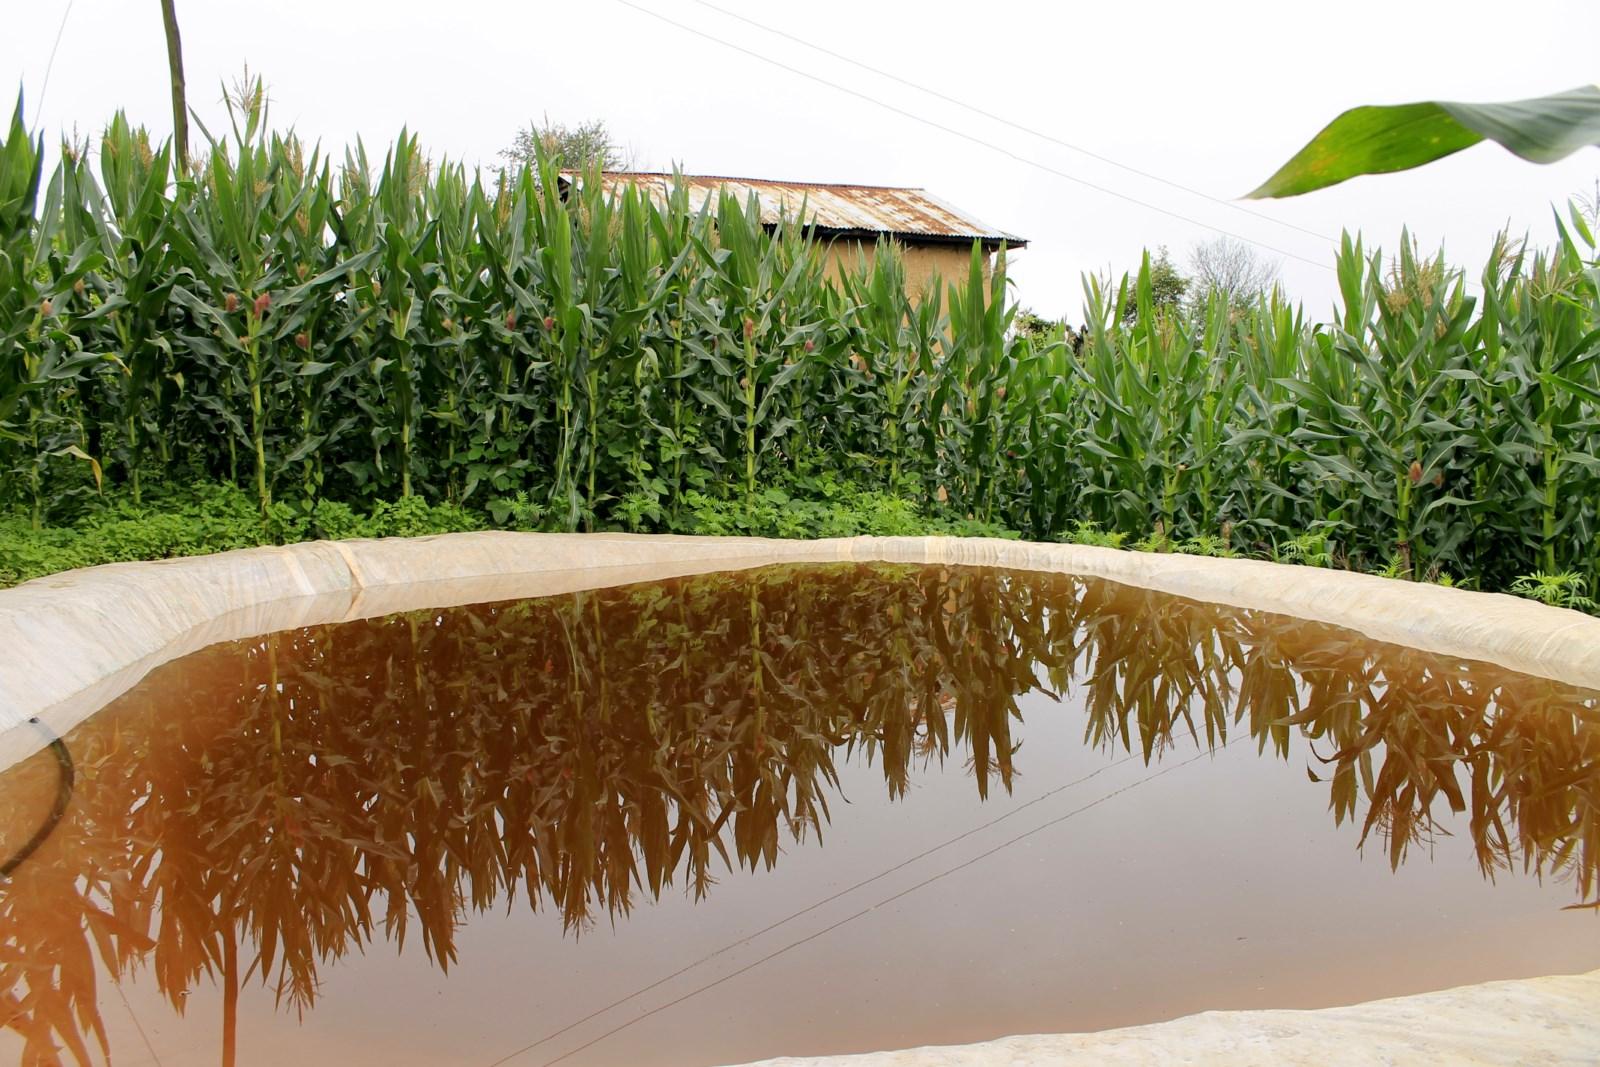 Description rainwater harvesting system jpg - File Rainwater Harvesting And Plastic Pond 3 Jpg